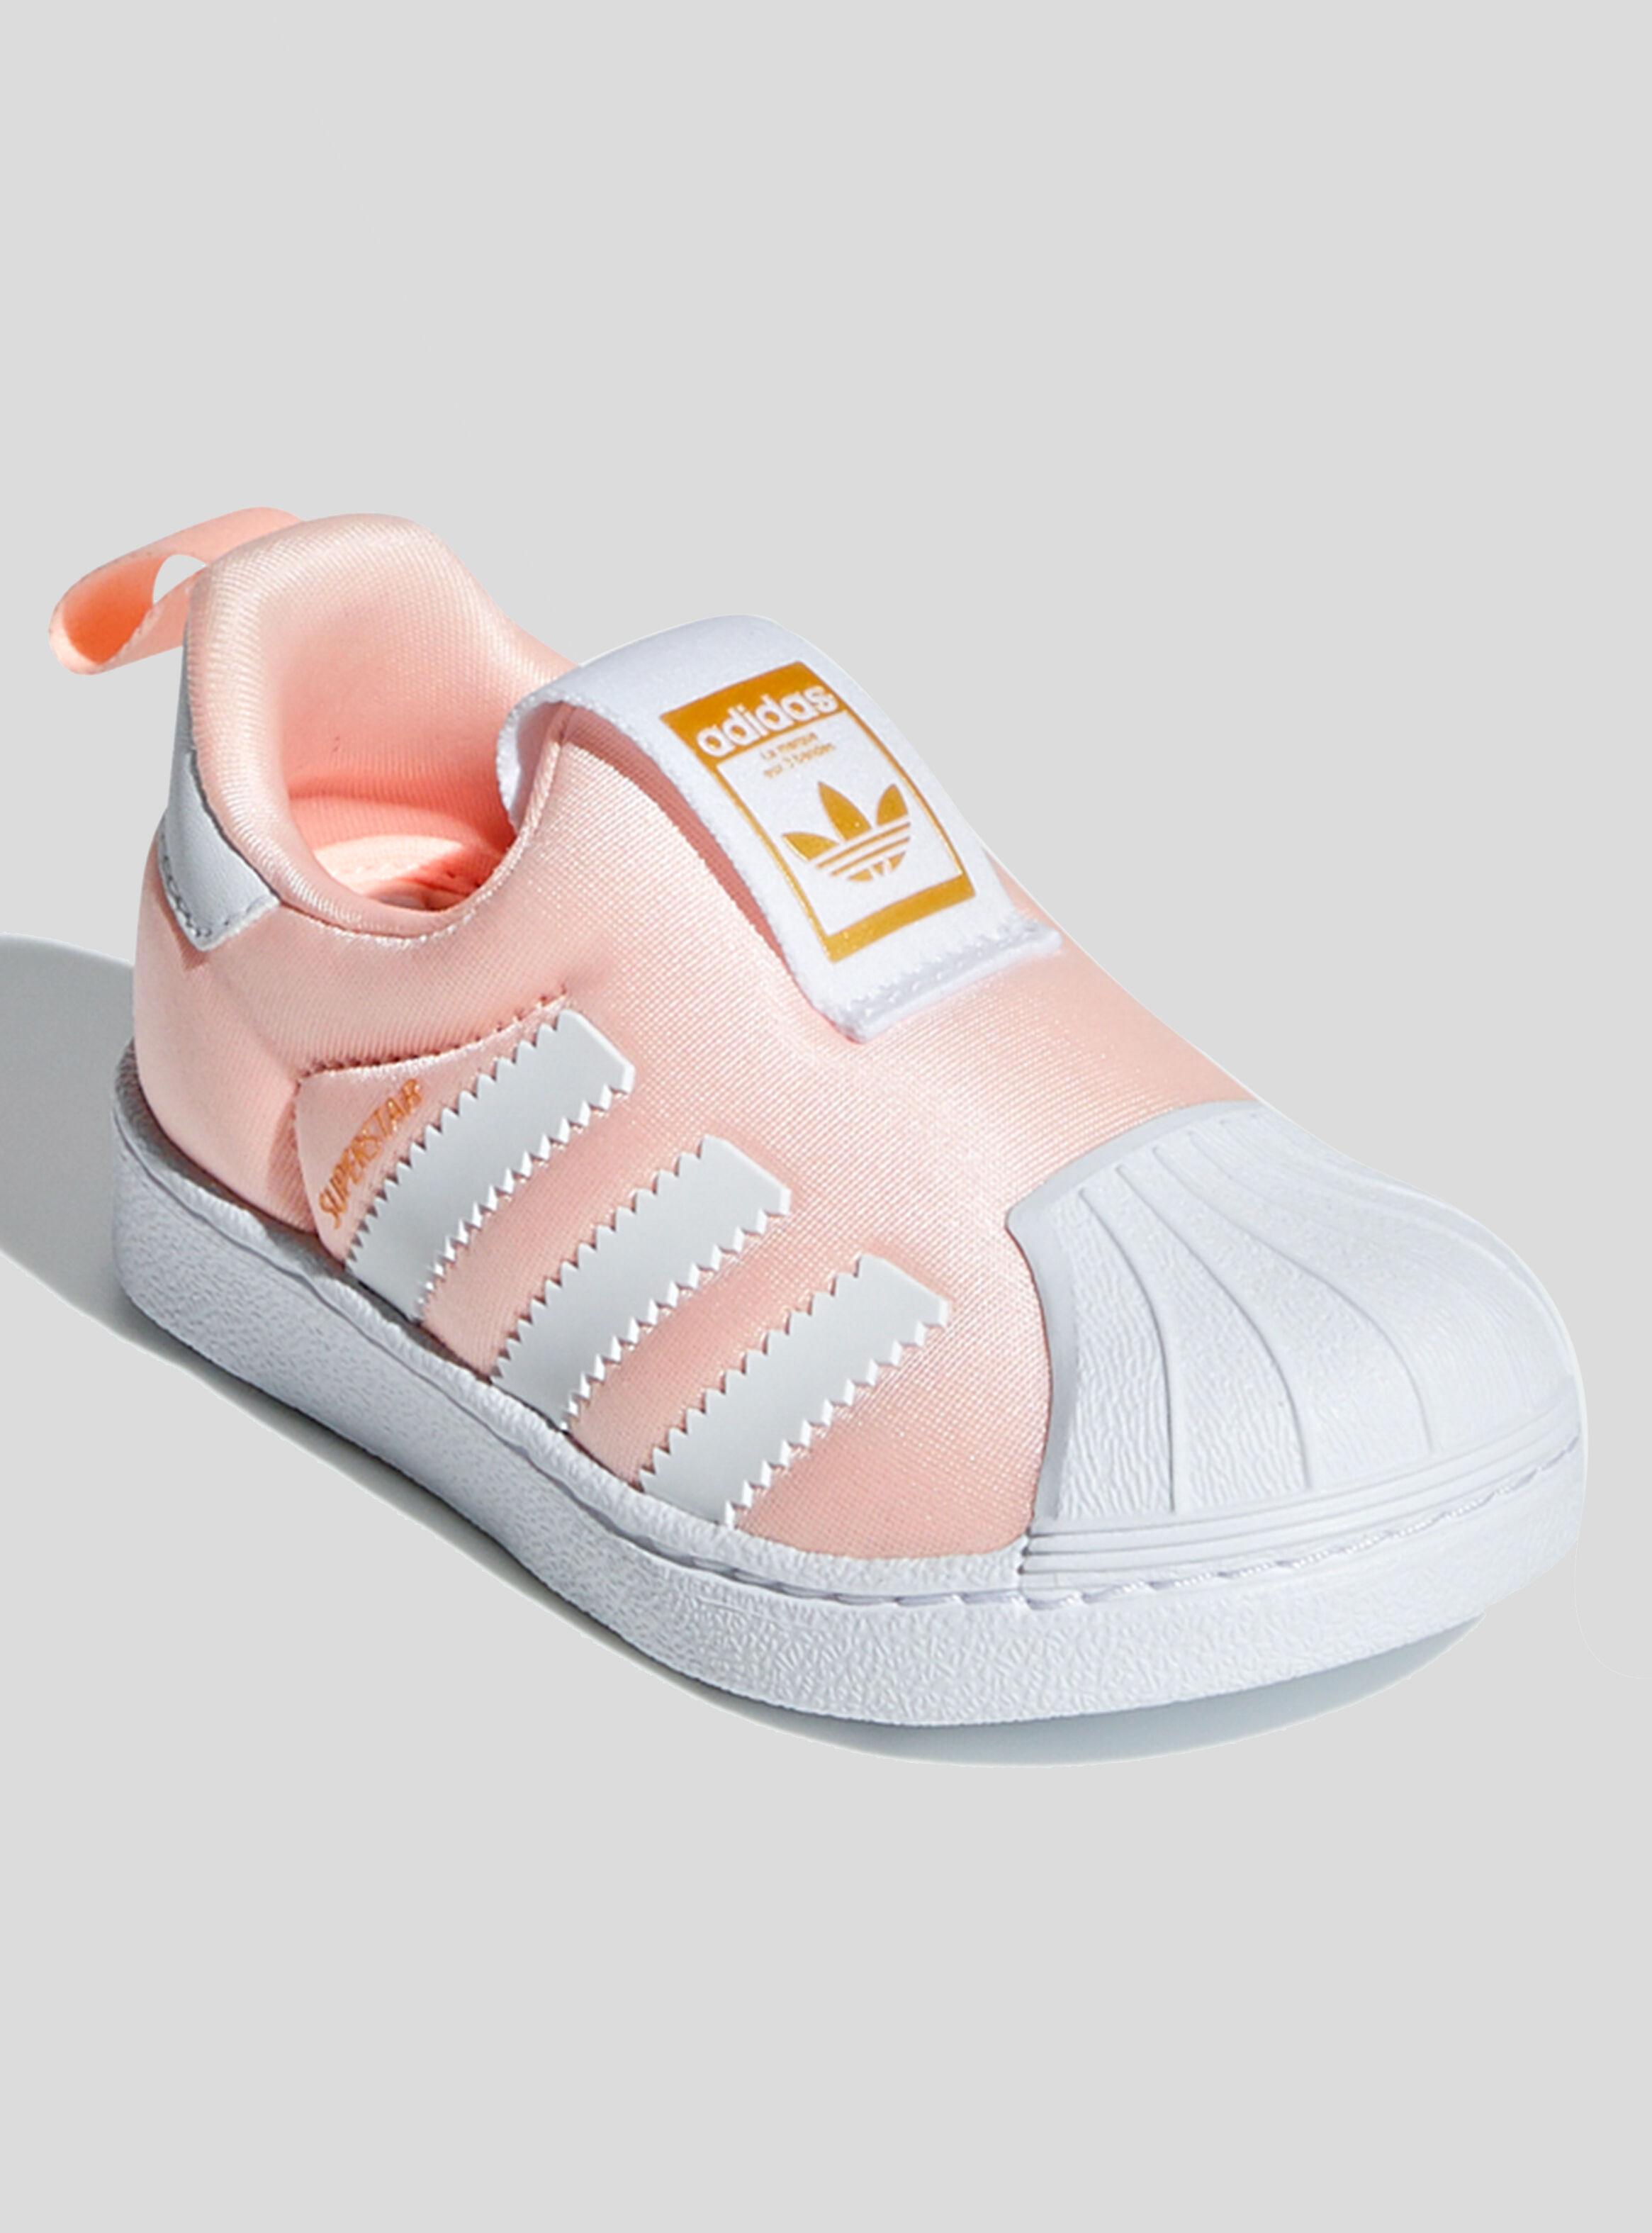 adidas superstar rosa gold | Benvenuto per comprare